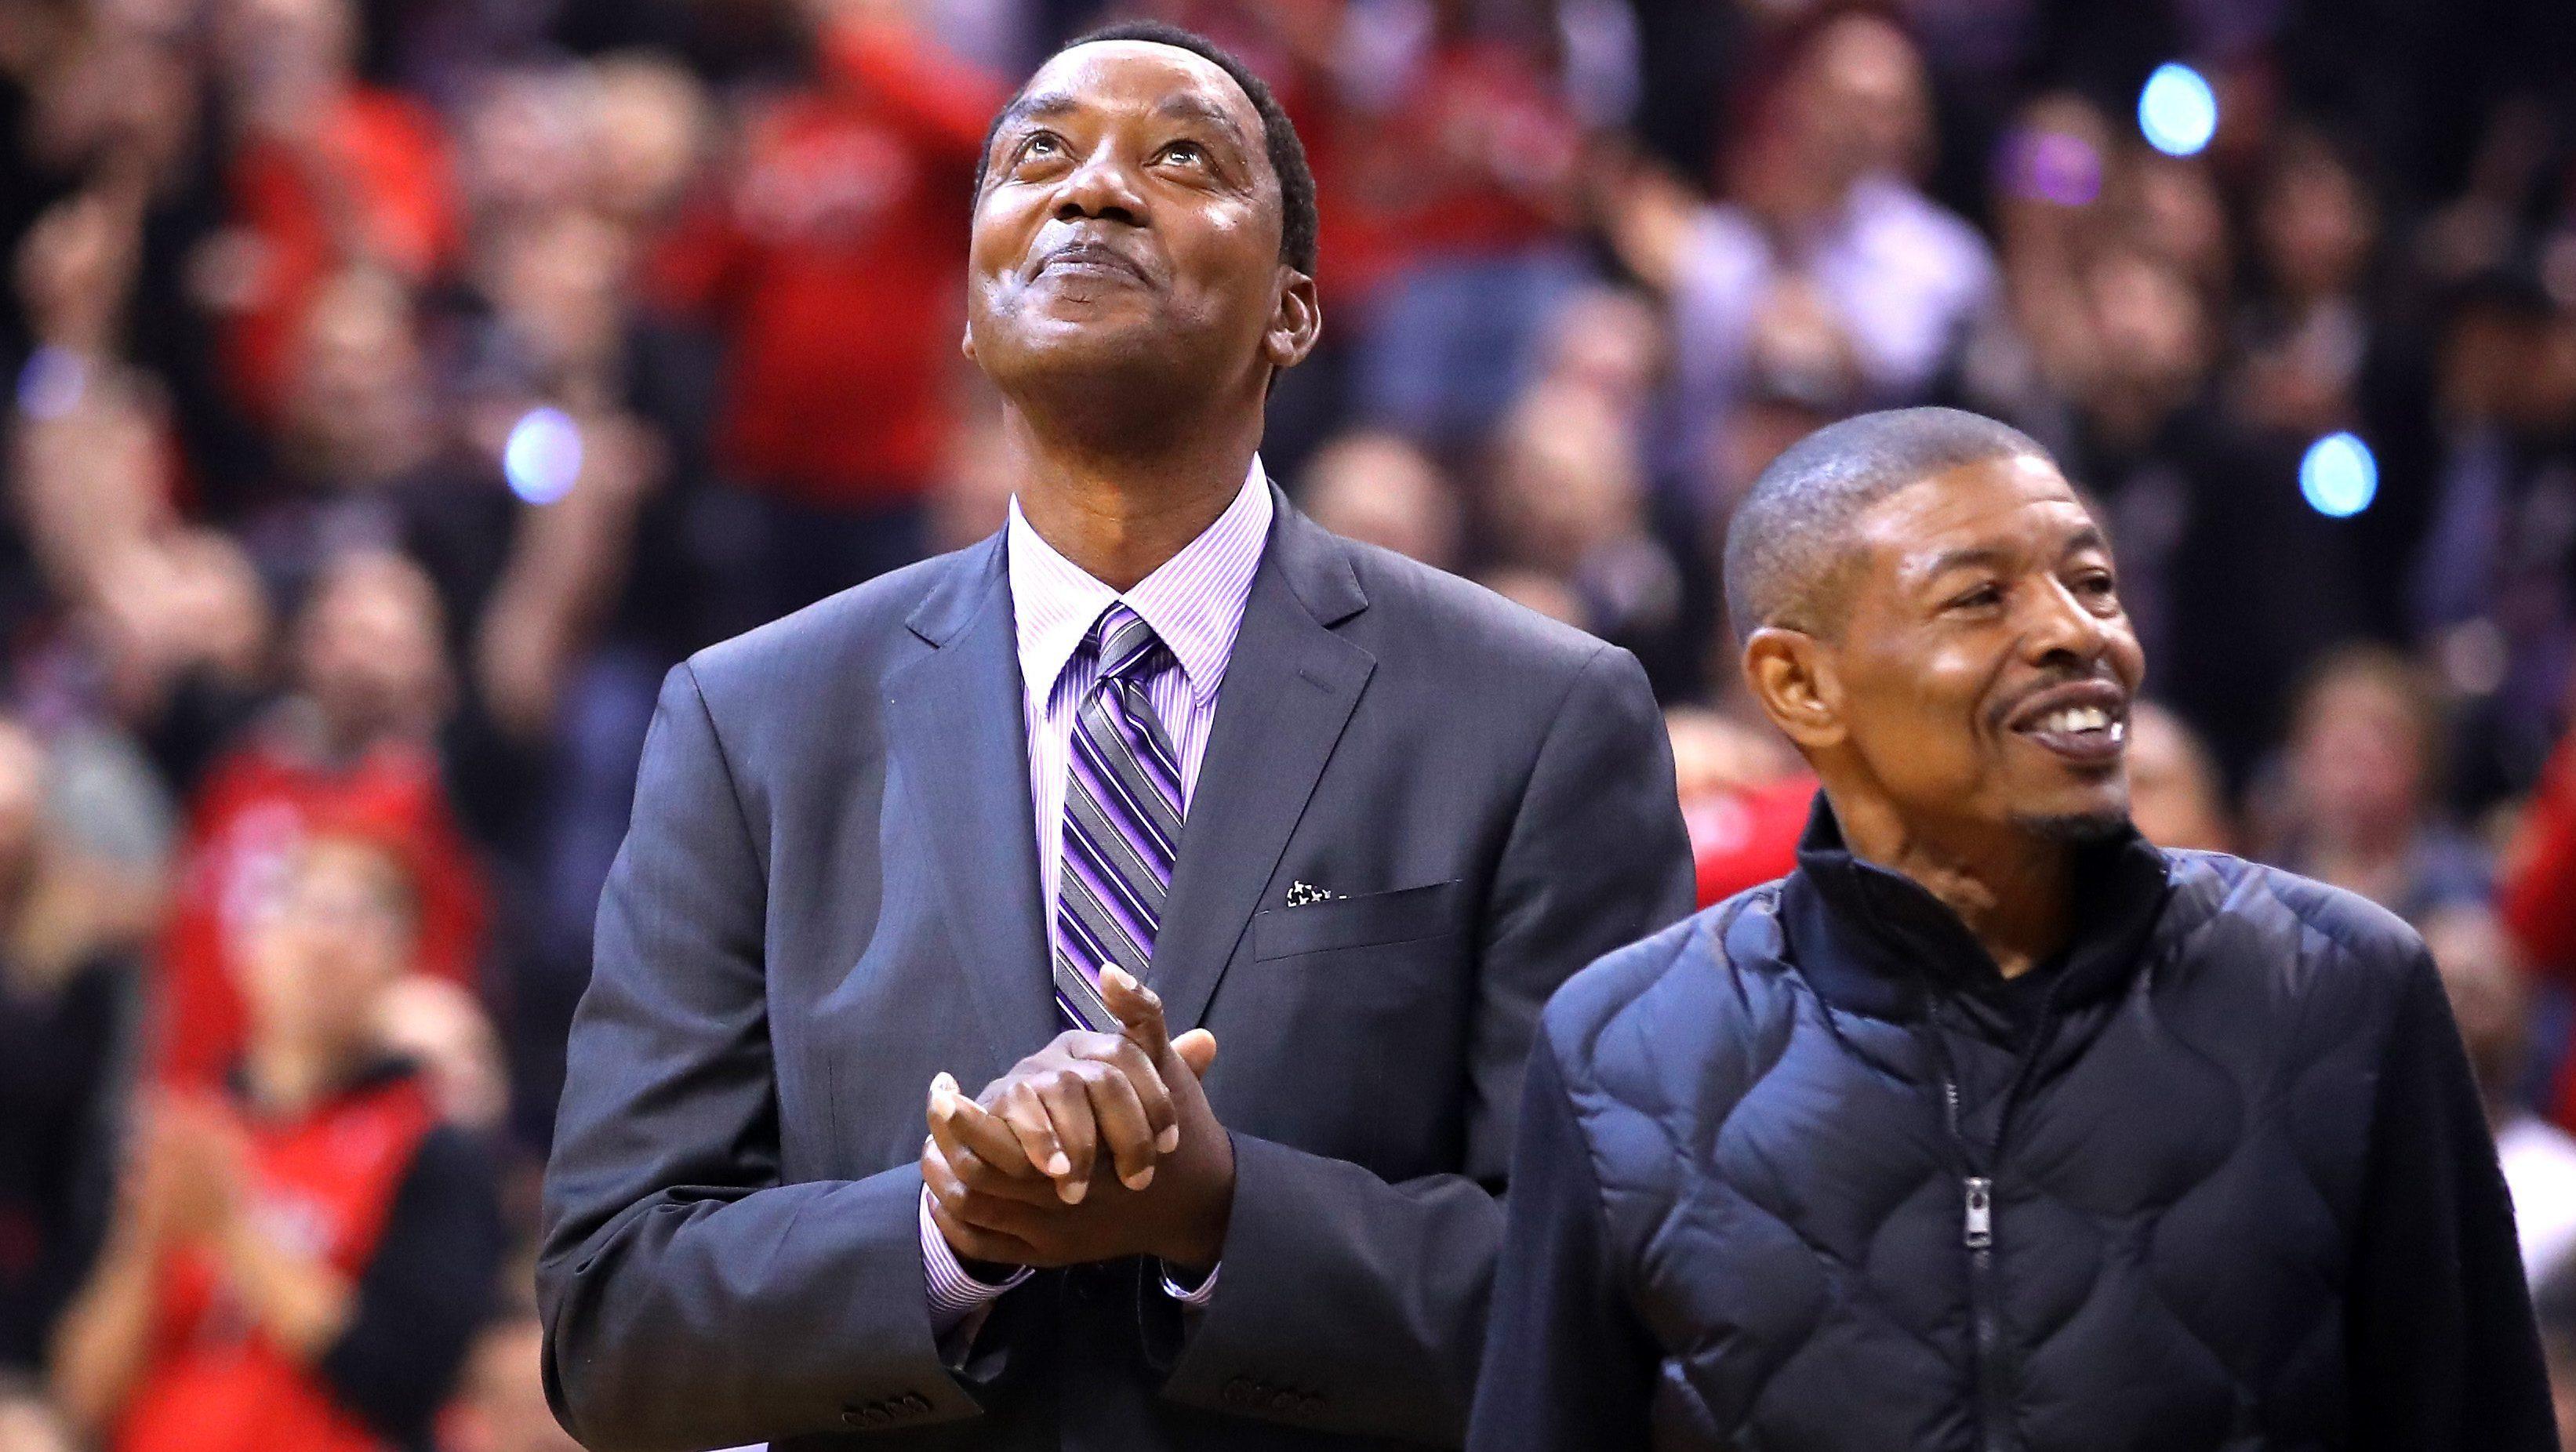 hoodie Toronto Raptors The North has Spoken NBA basketball champions